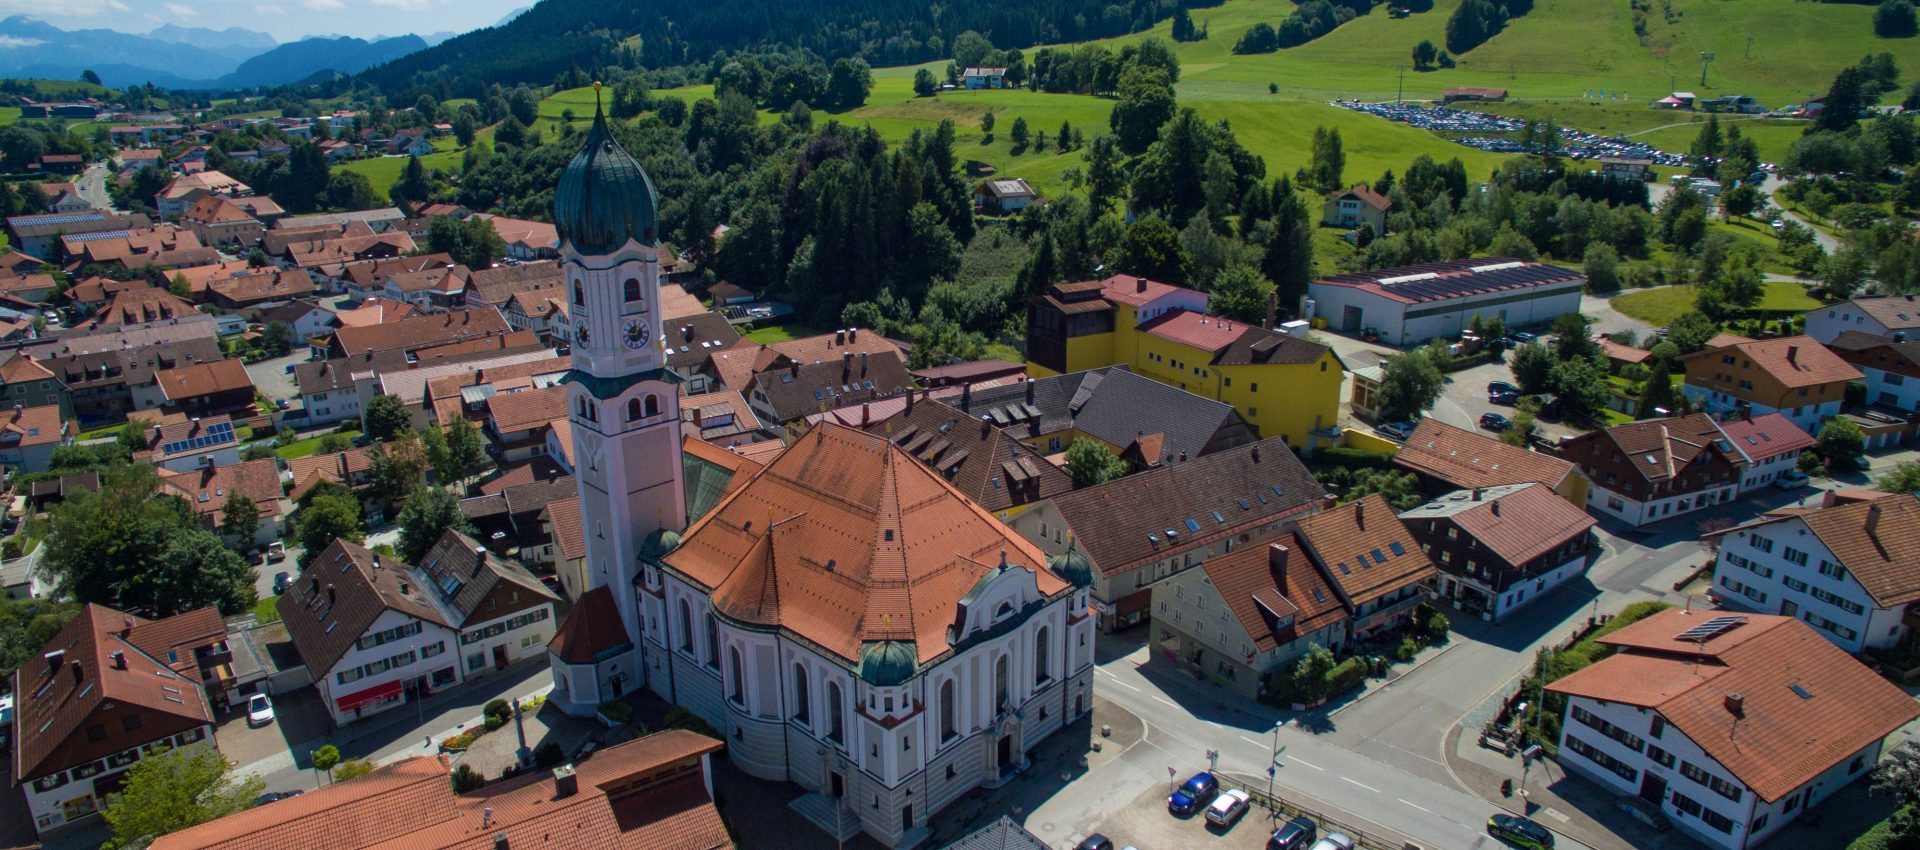 Kirche in Nesselwang